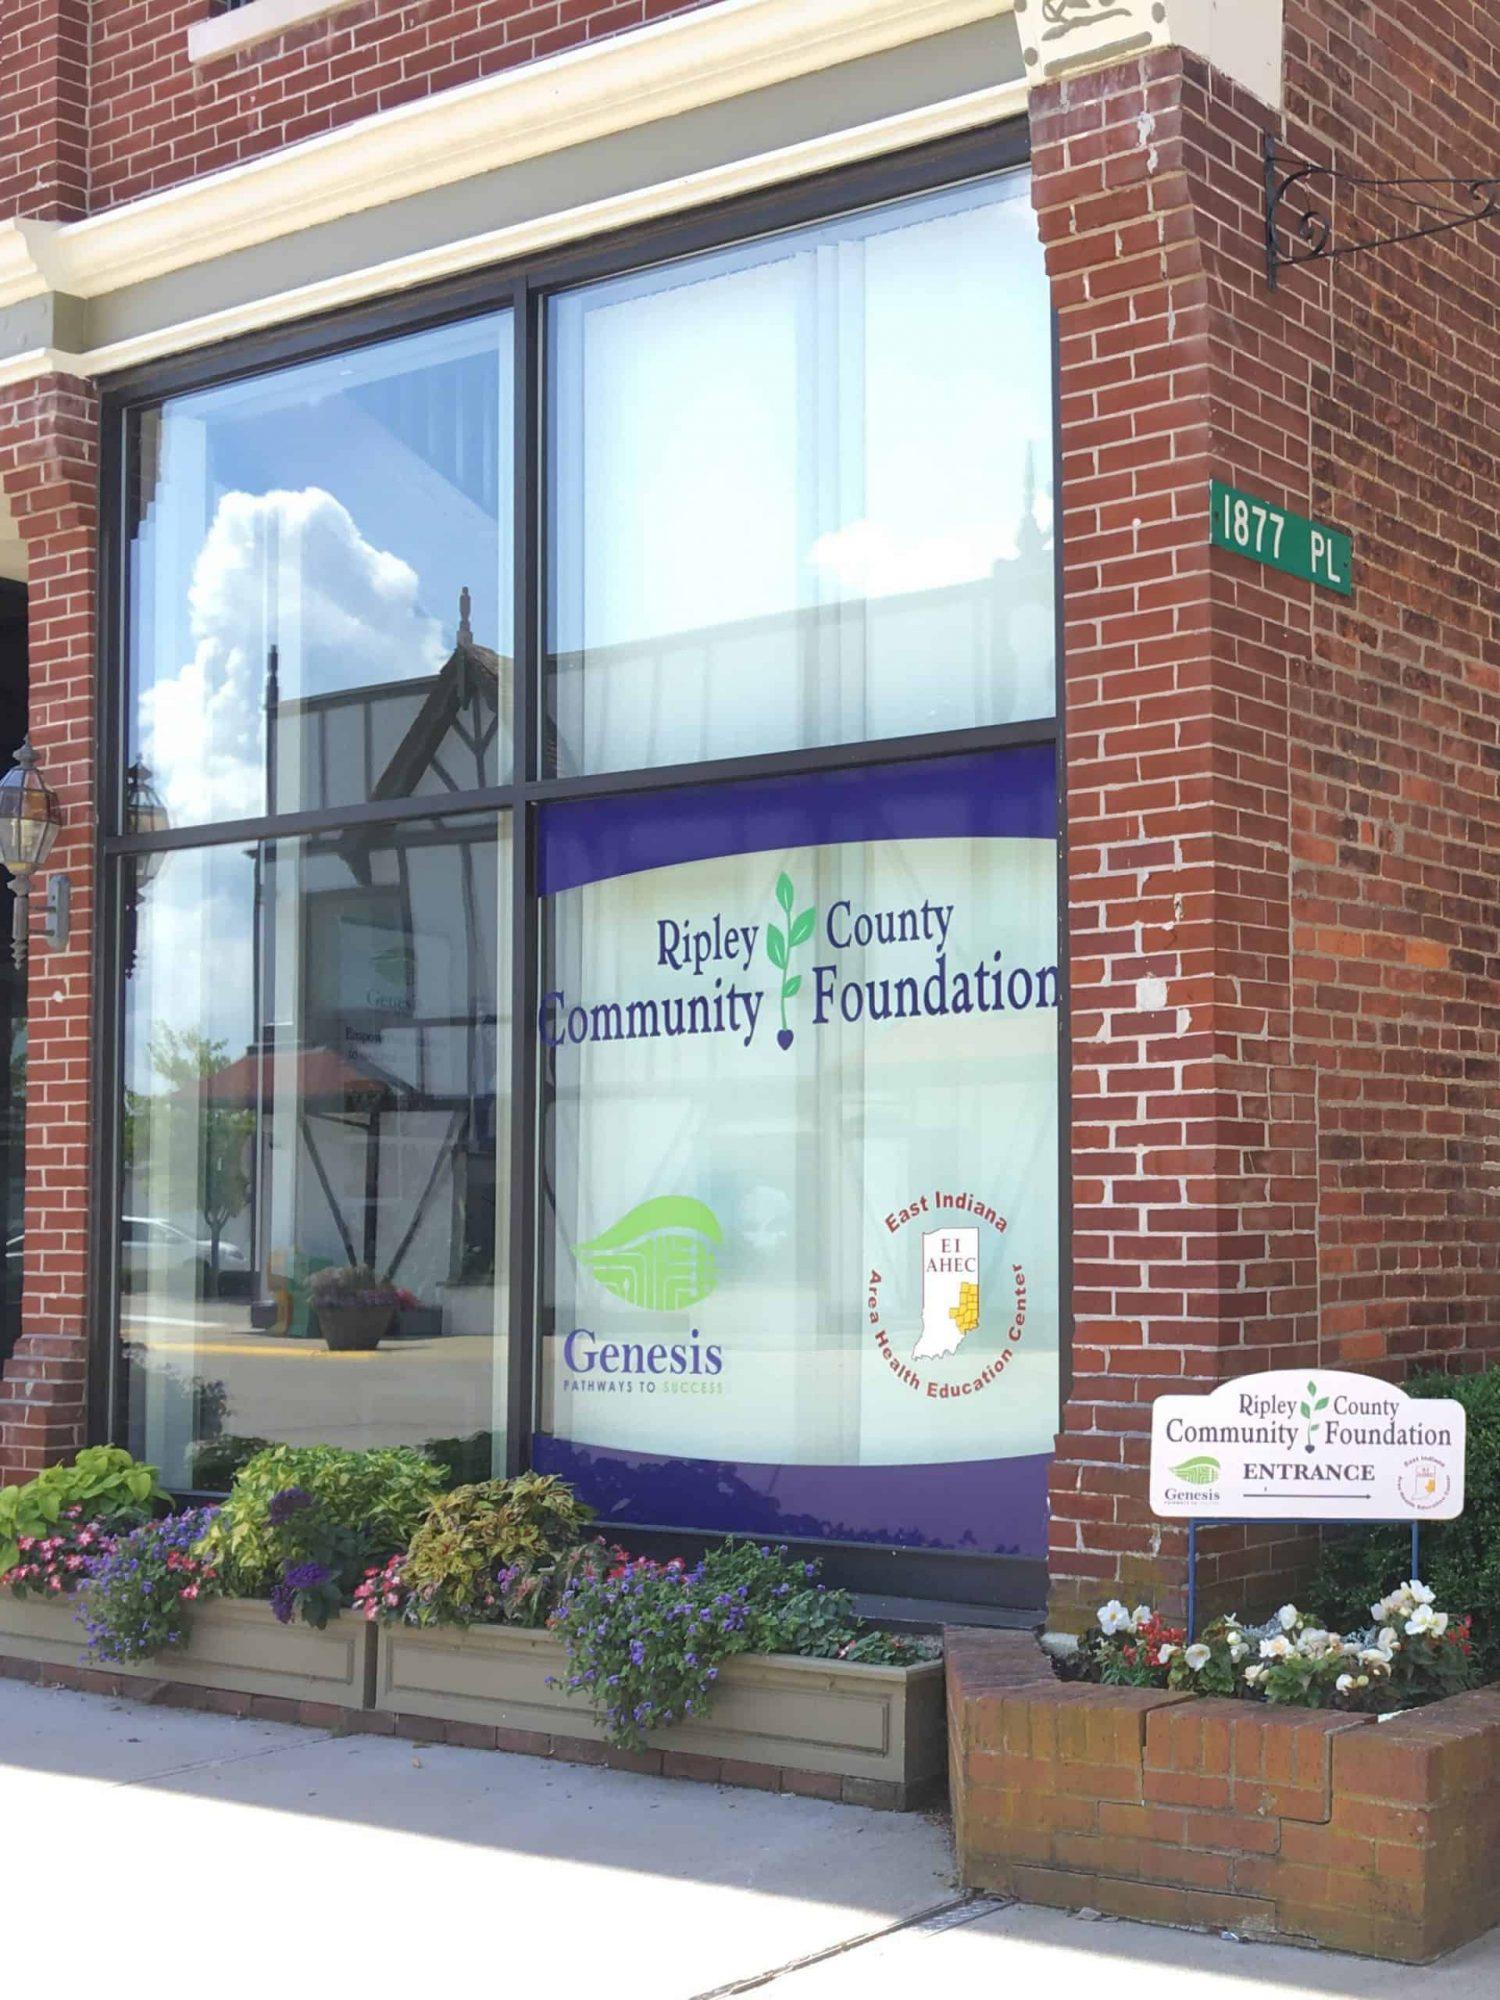 Ripley County Community Foundation Office - July 2019